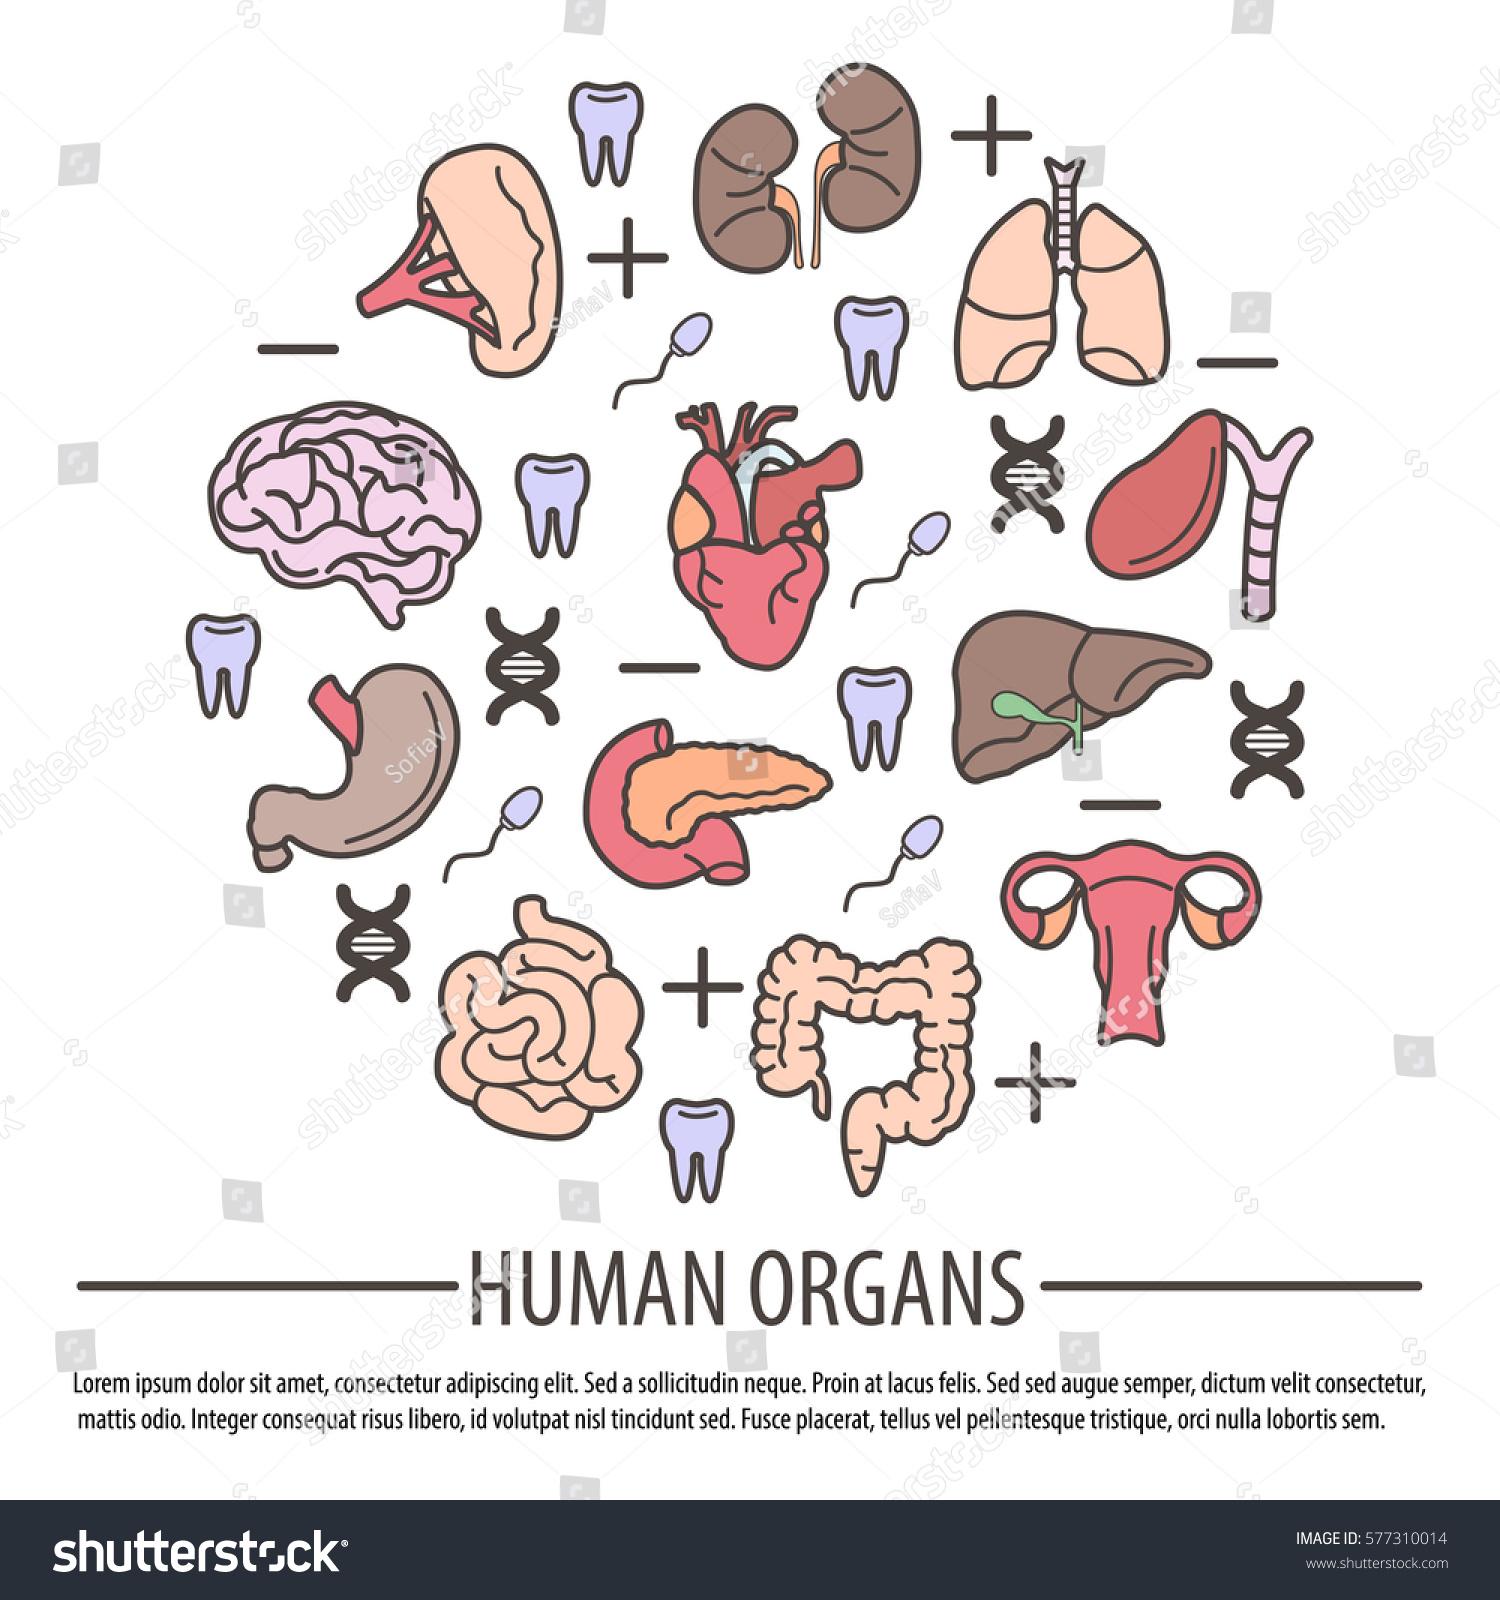 Human Organs Dna Parts Rh Factors Stock Vector Royalty Free